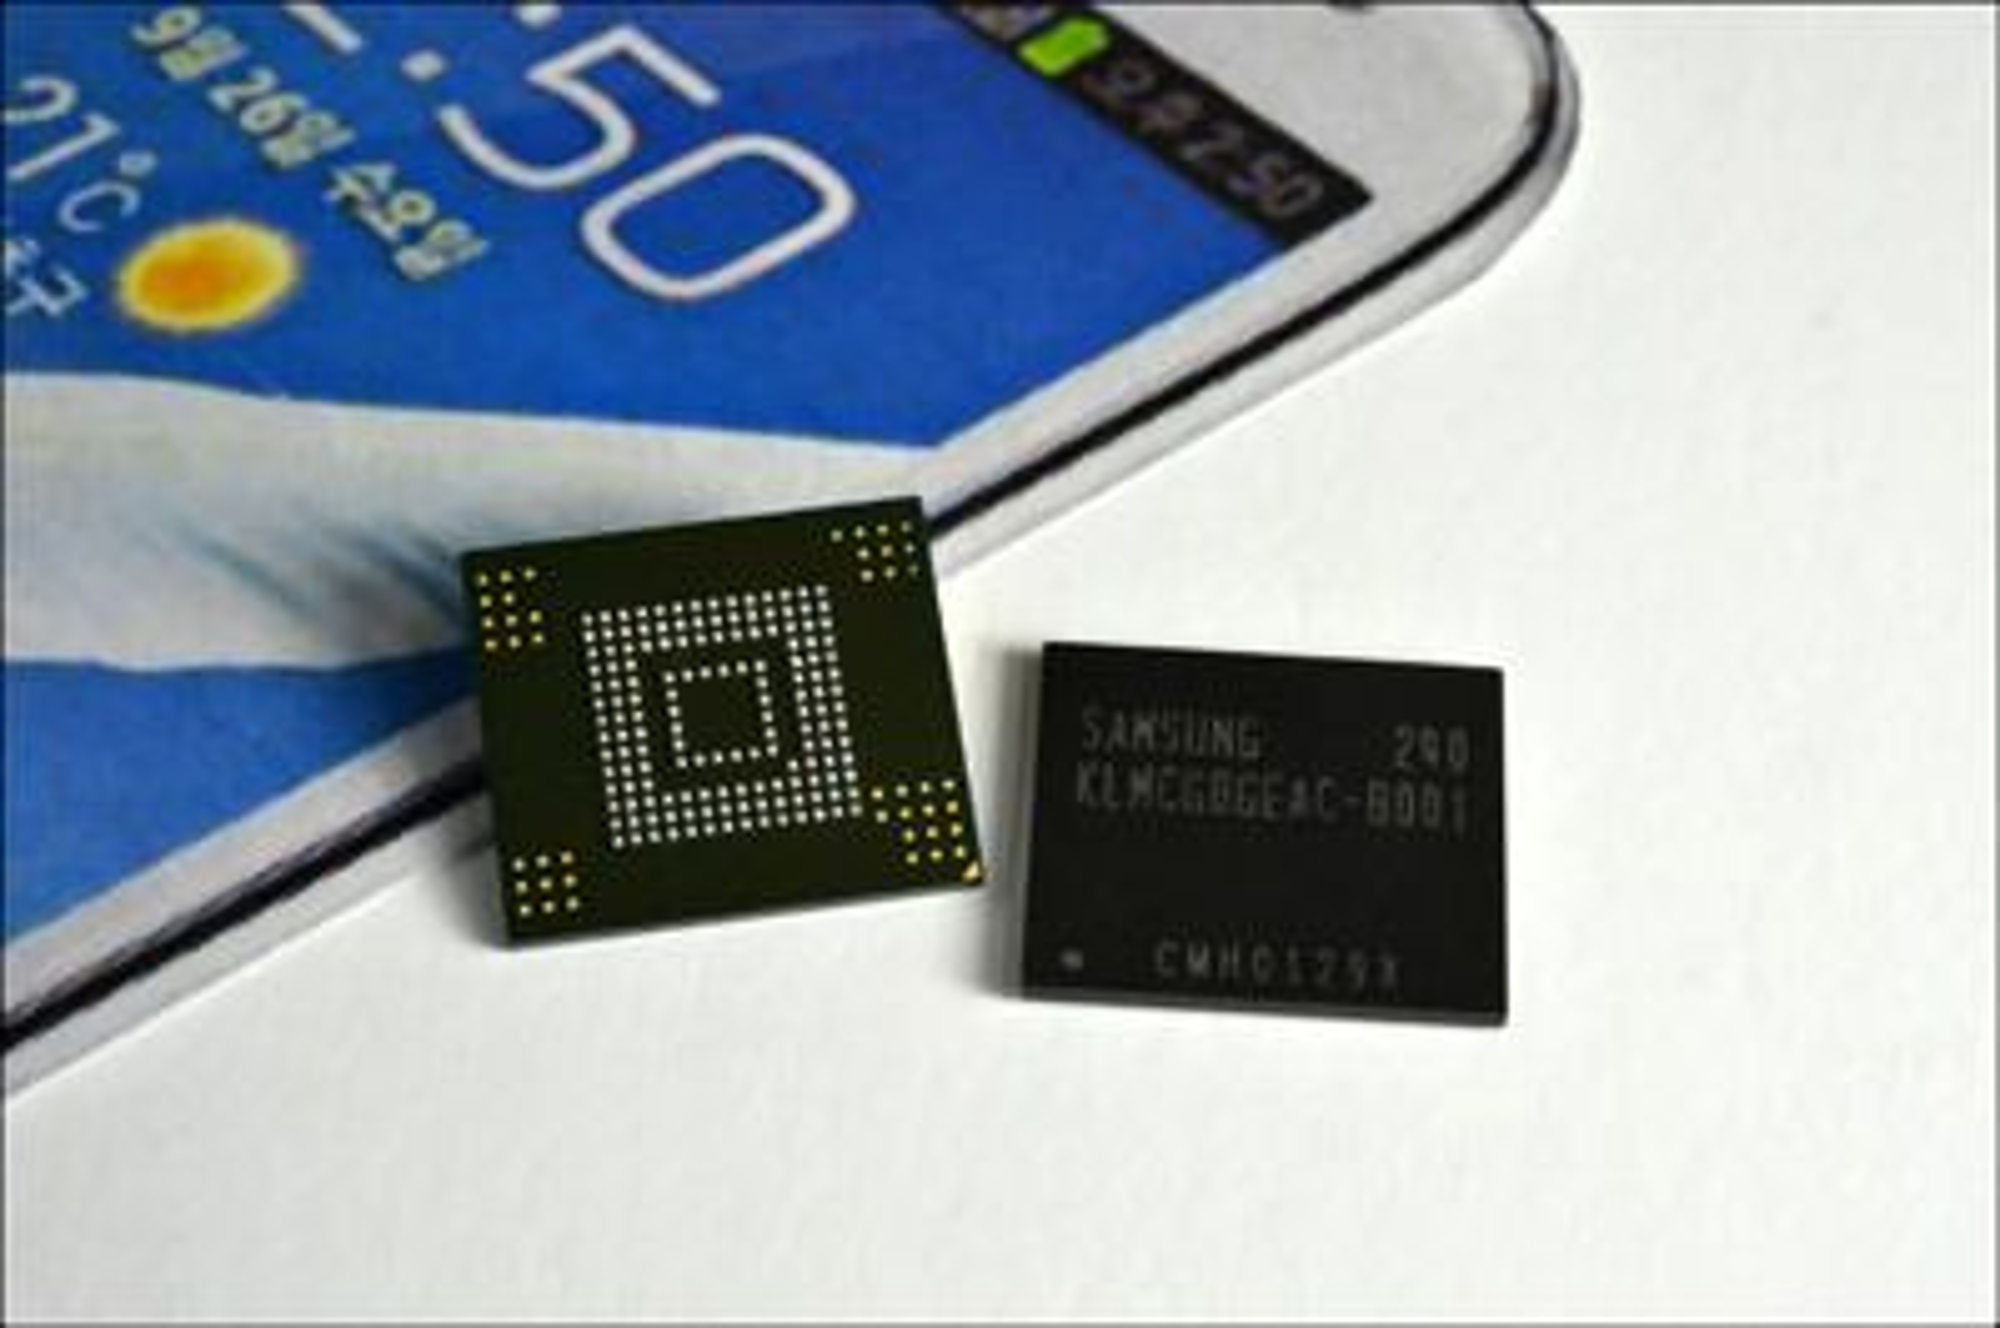 De nye flashminne-modulene til Samsung.